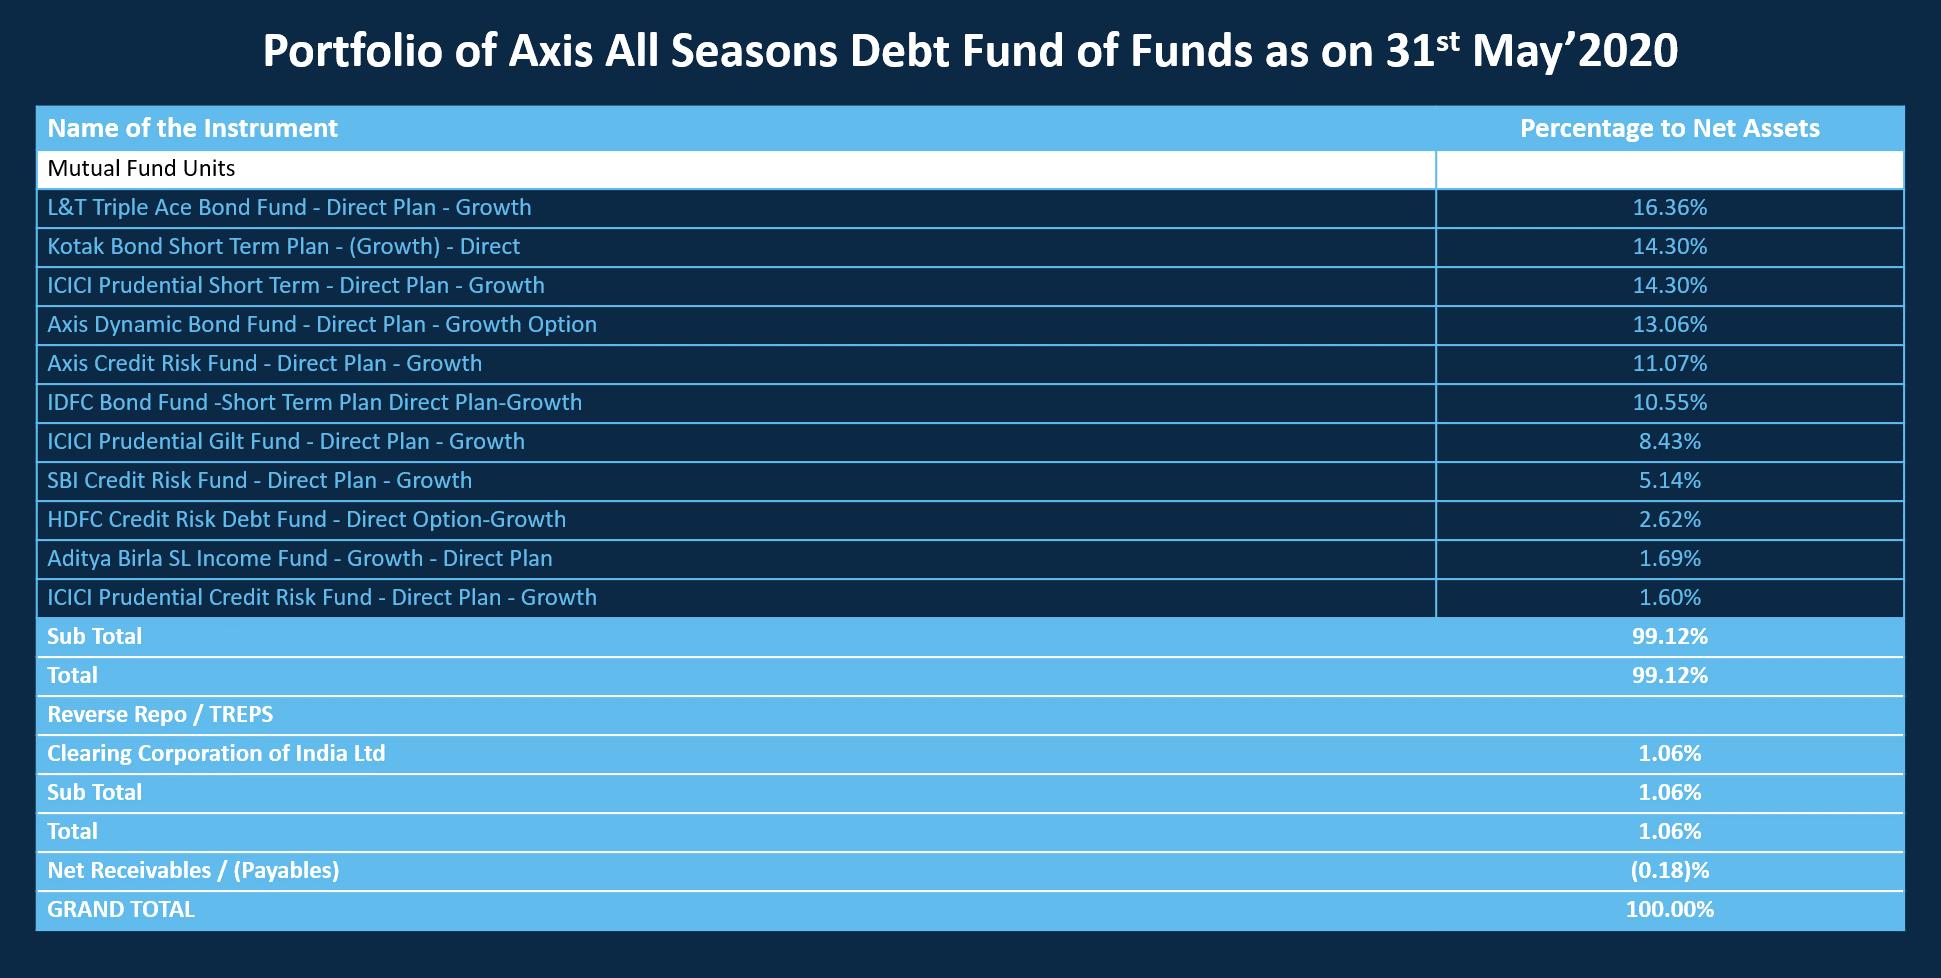 portfolio - Axis All Season Debt Fund of Fund